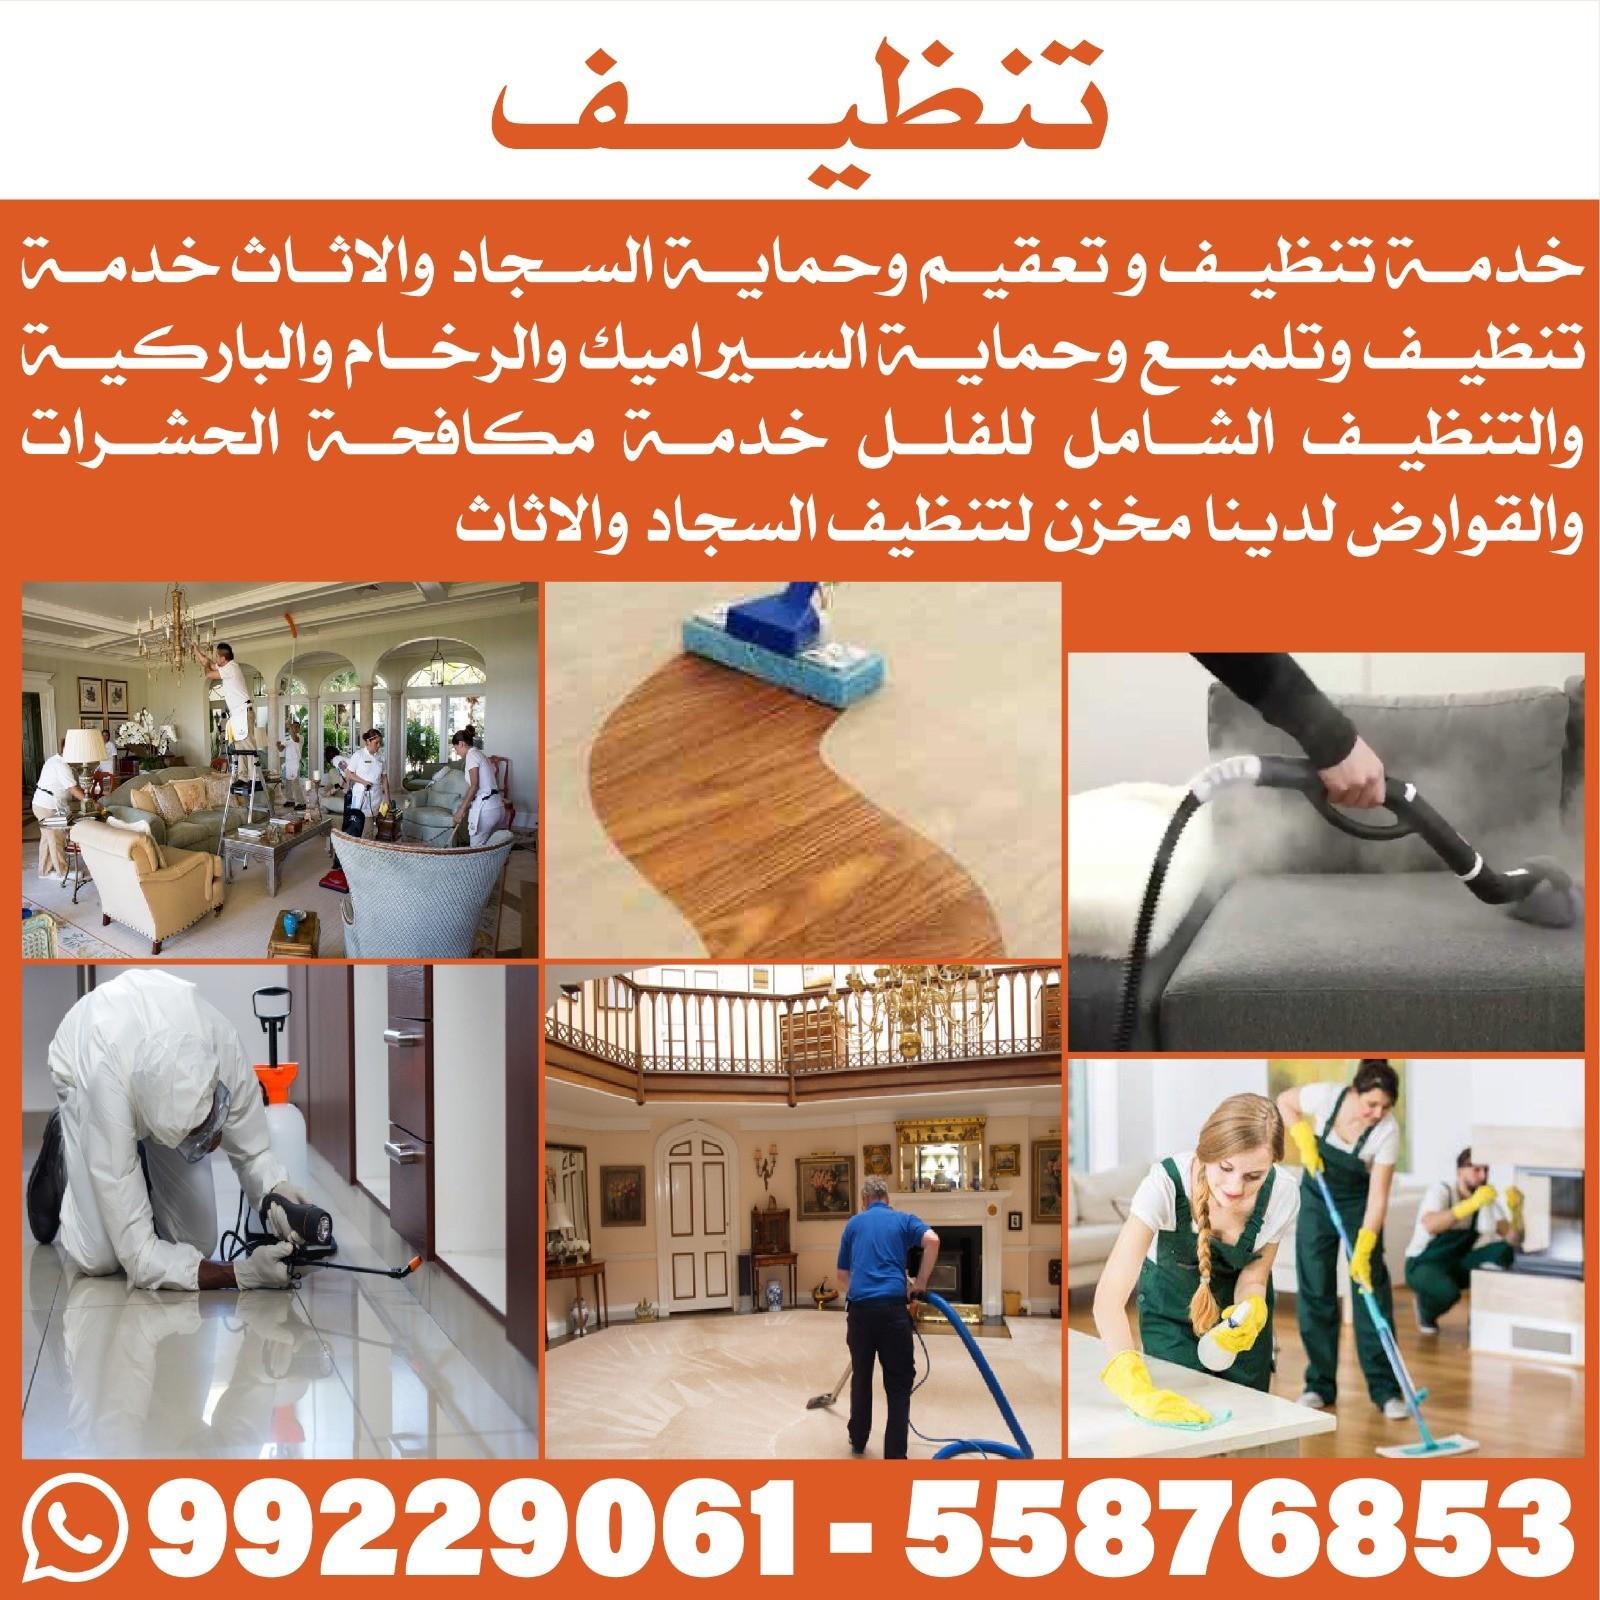 تنظيف 99229061-55876853